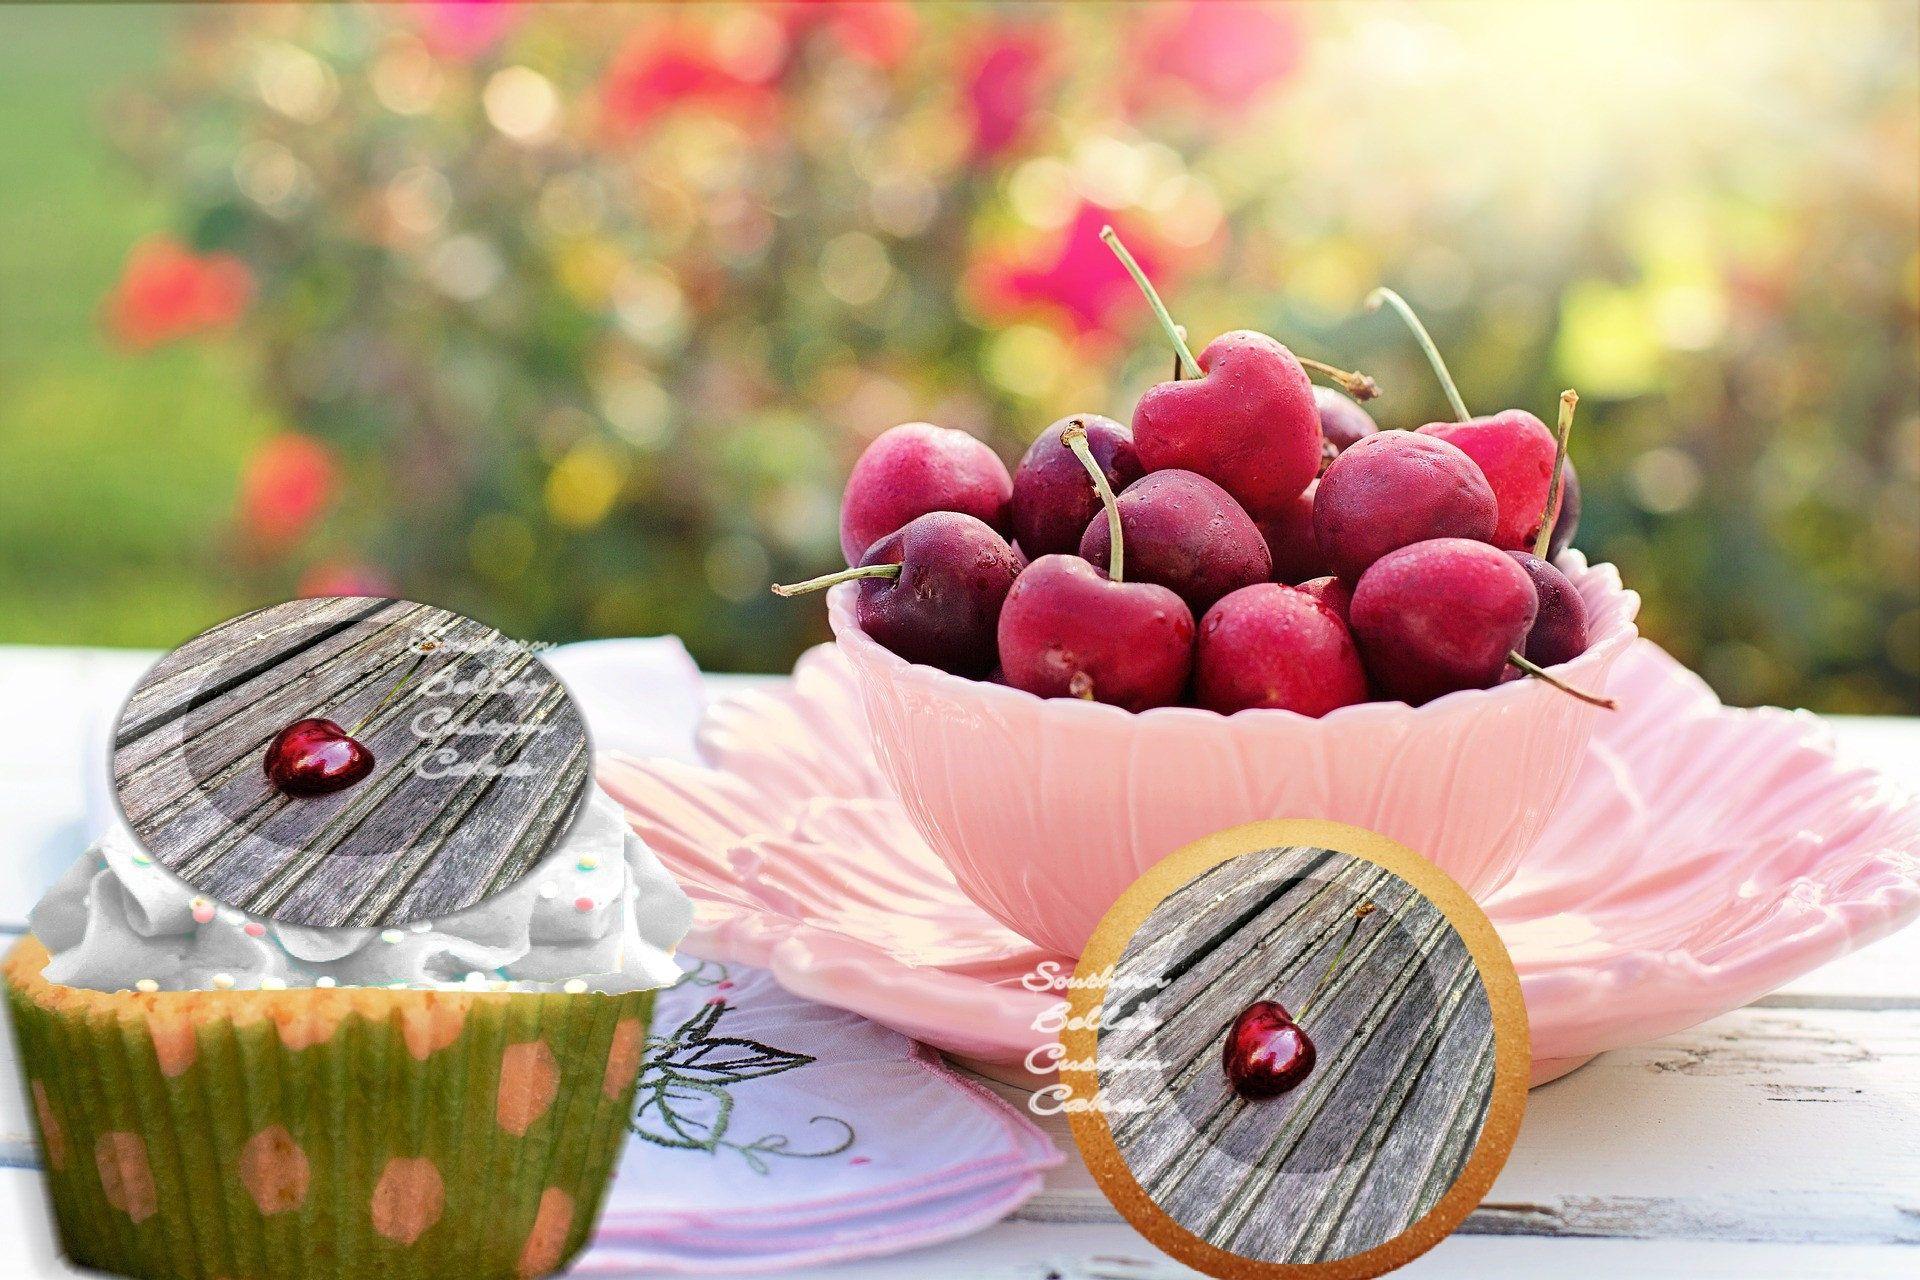 Edible barn board cherry cookietopperedible cherry cake